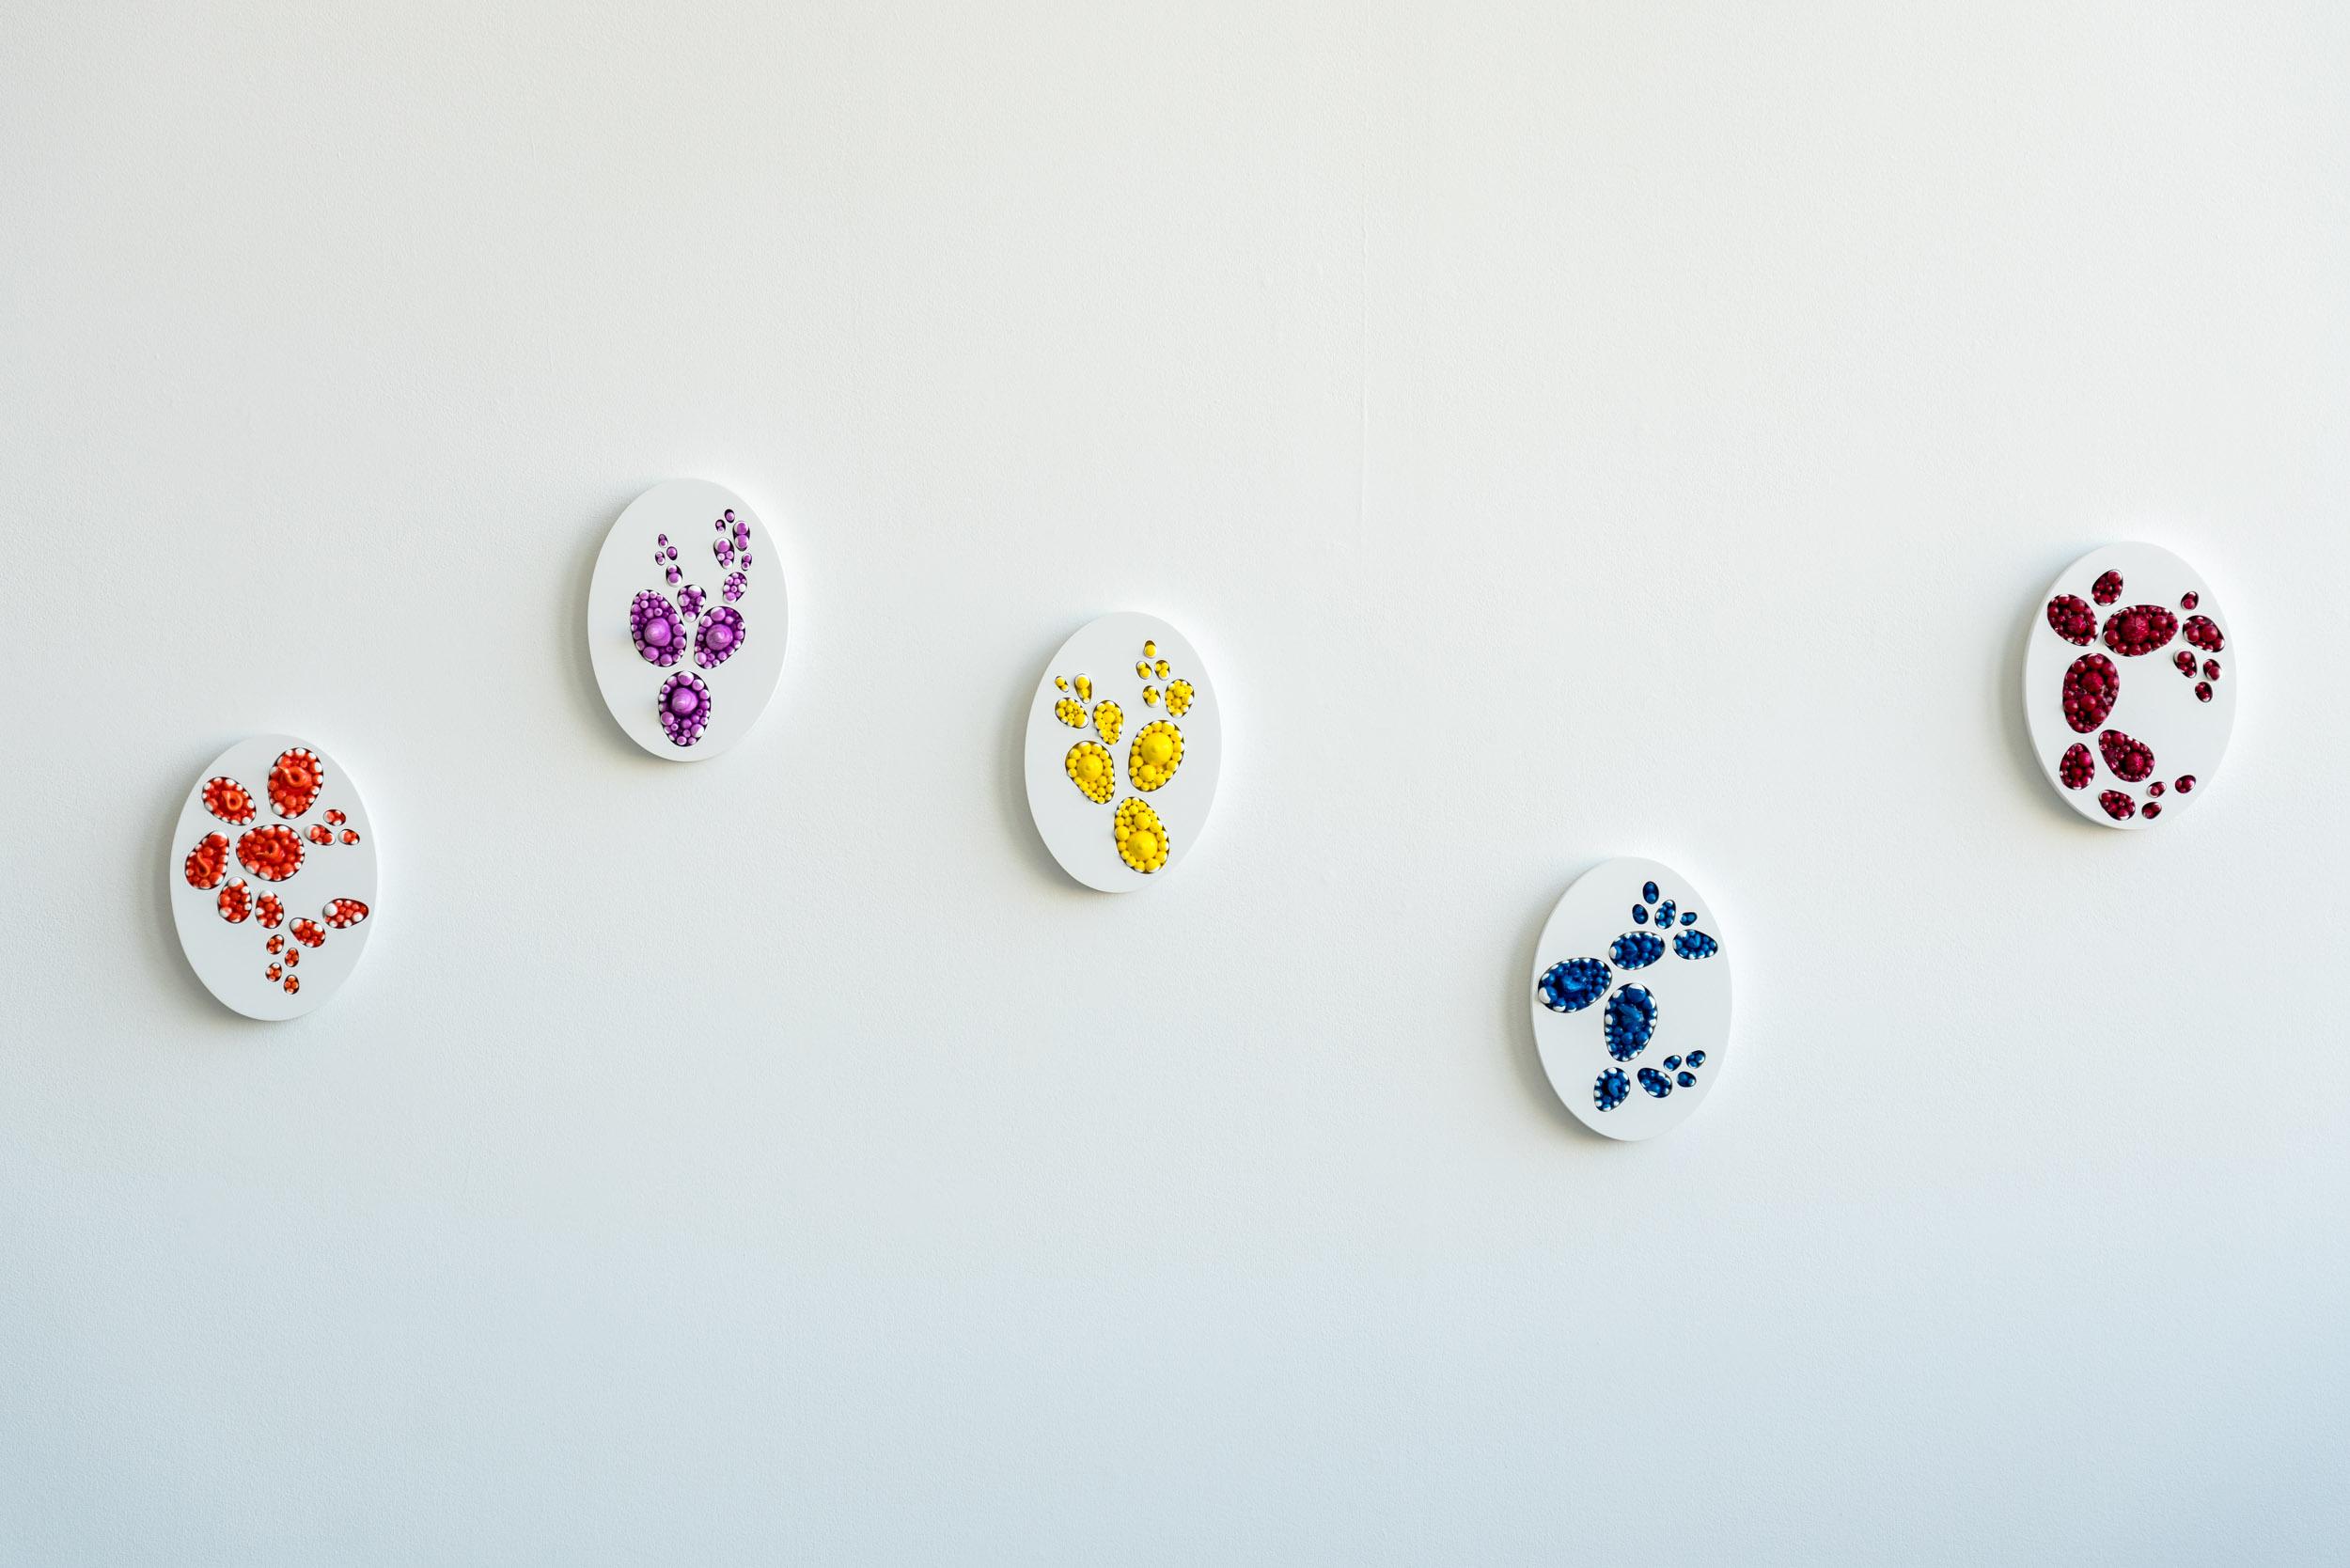 The Sugar Blossom Series